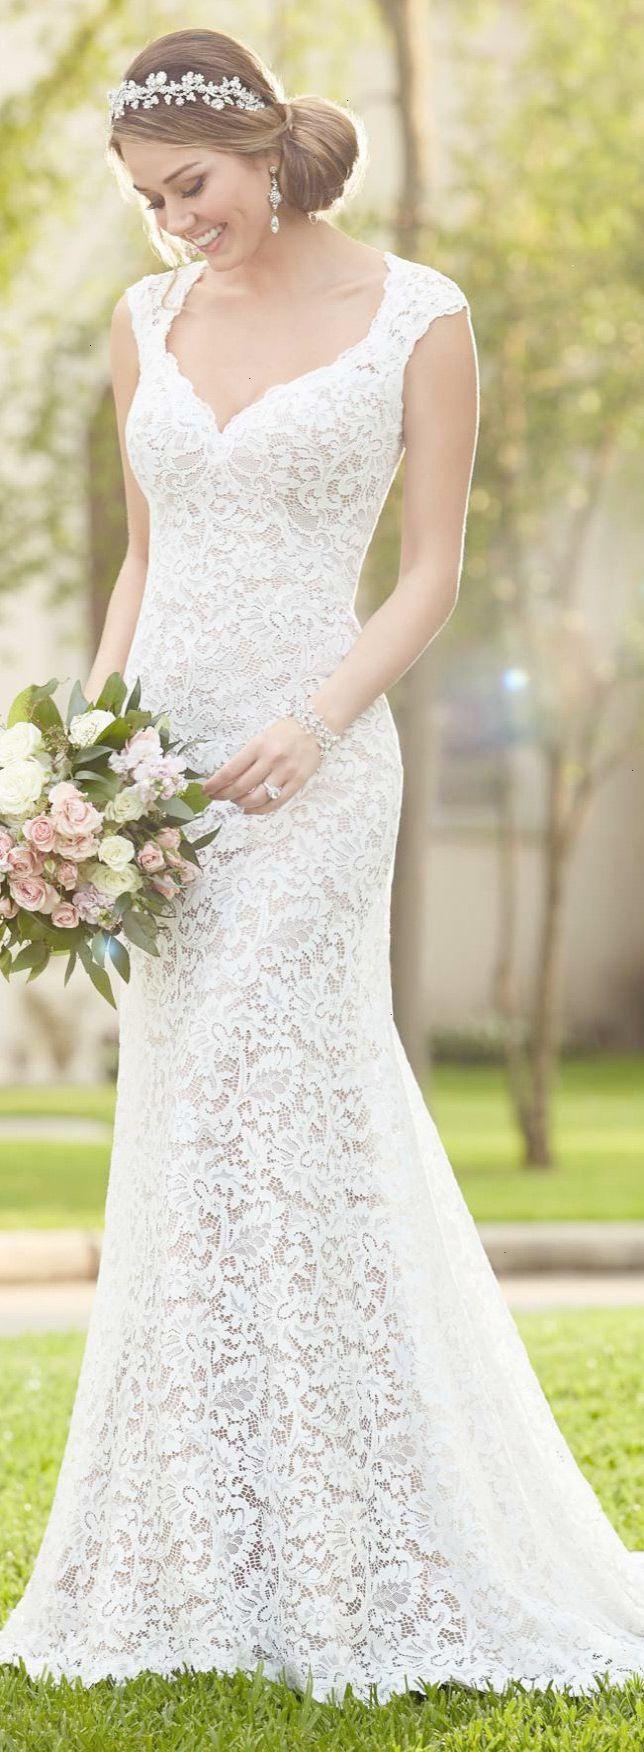 Stella york full lace wedding dress lace wedding dresses